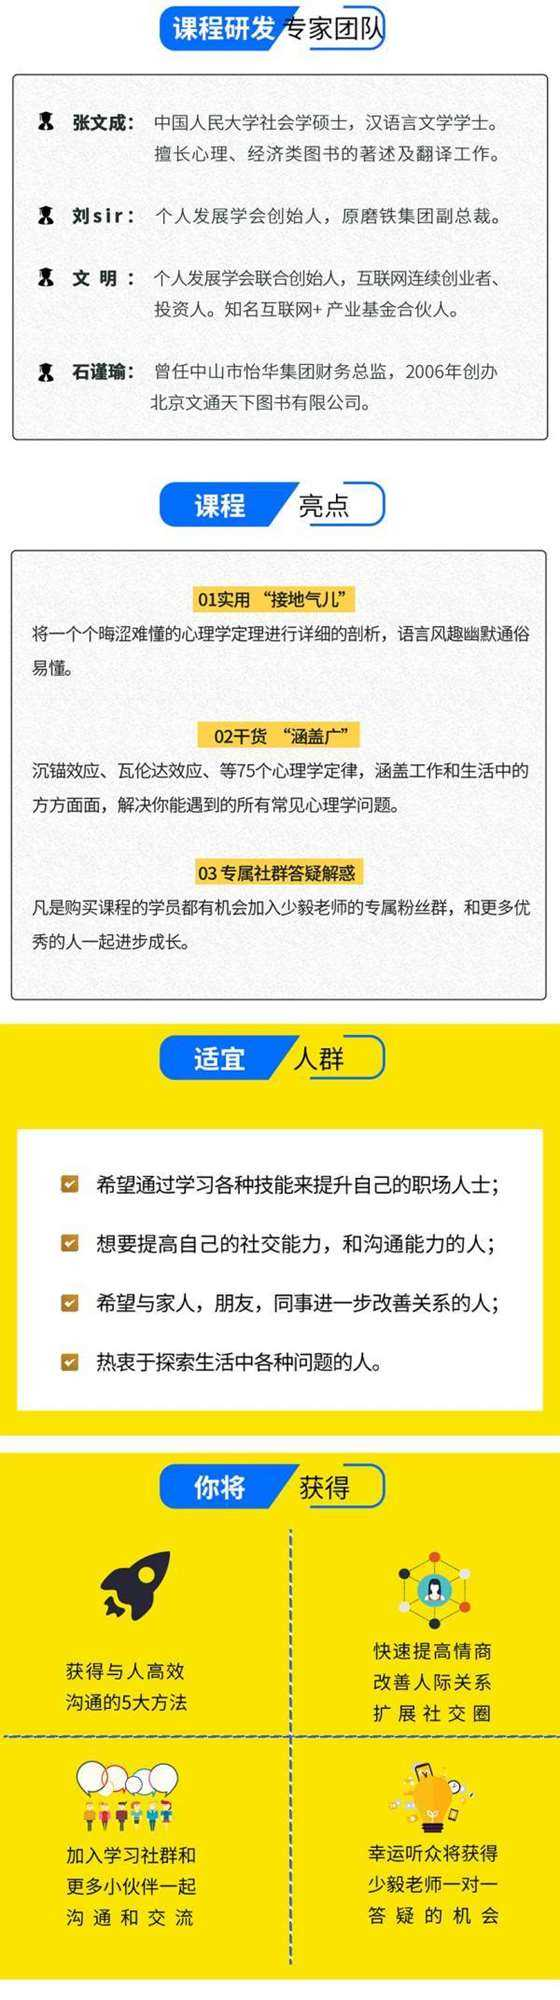 http://www.huodongxing.com/file/20160530/5092341960349/283192170877660.jpeg